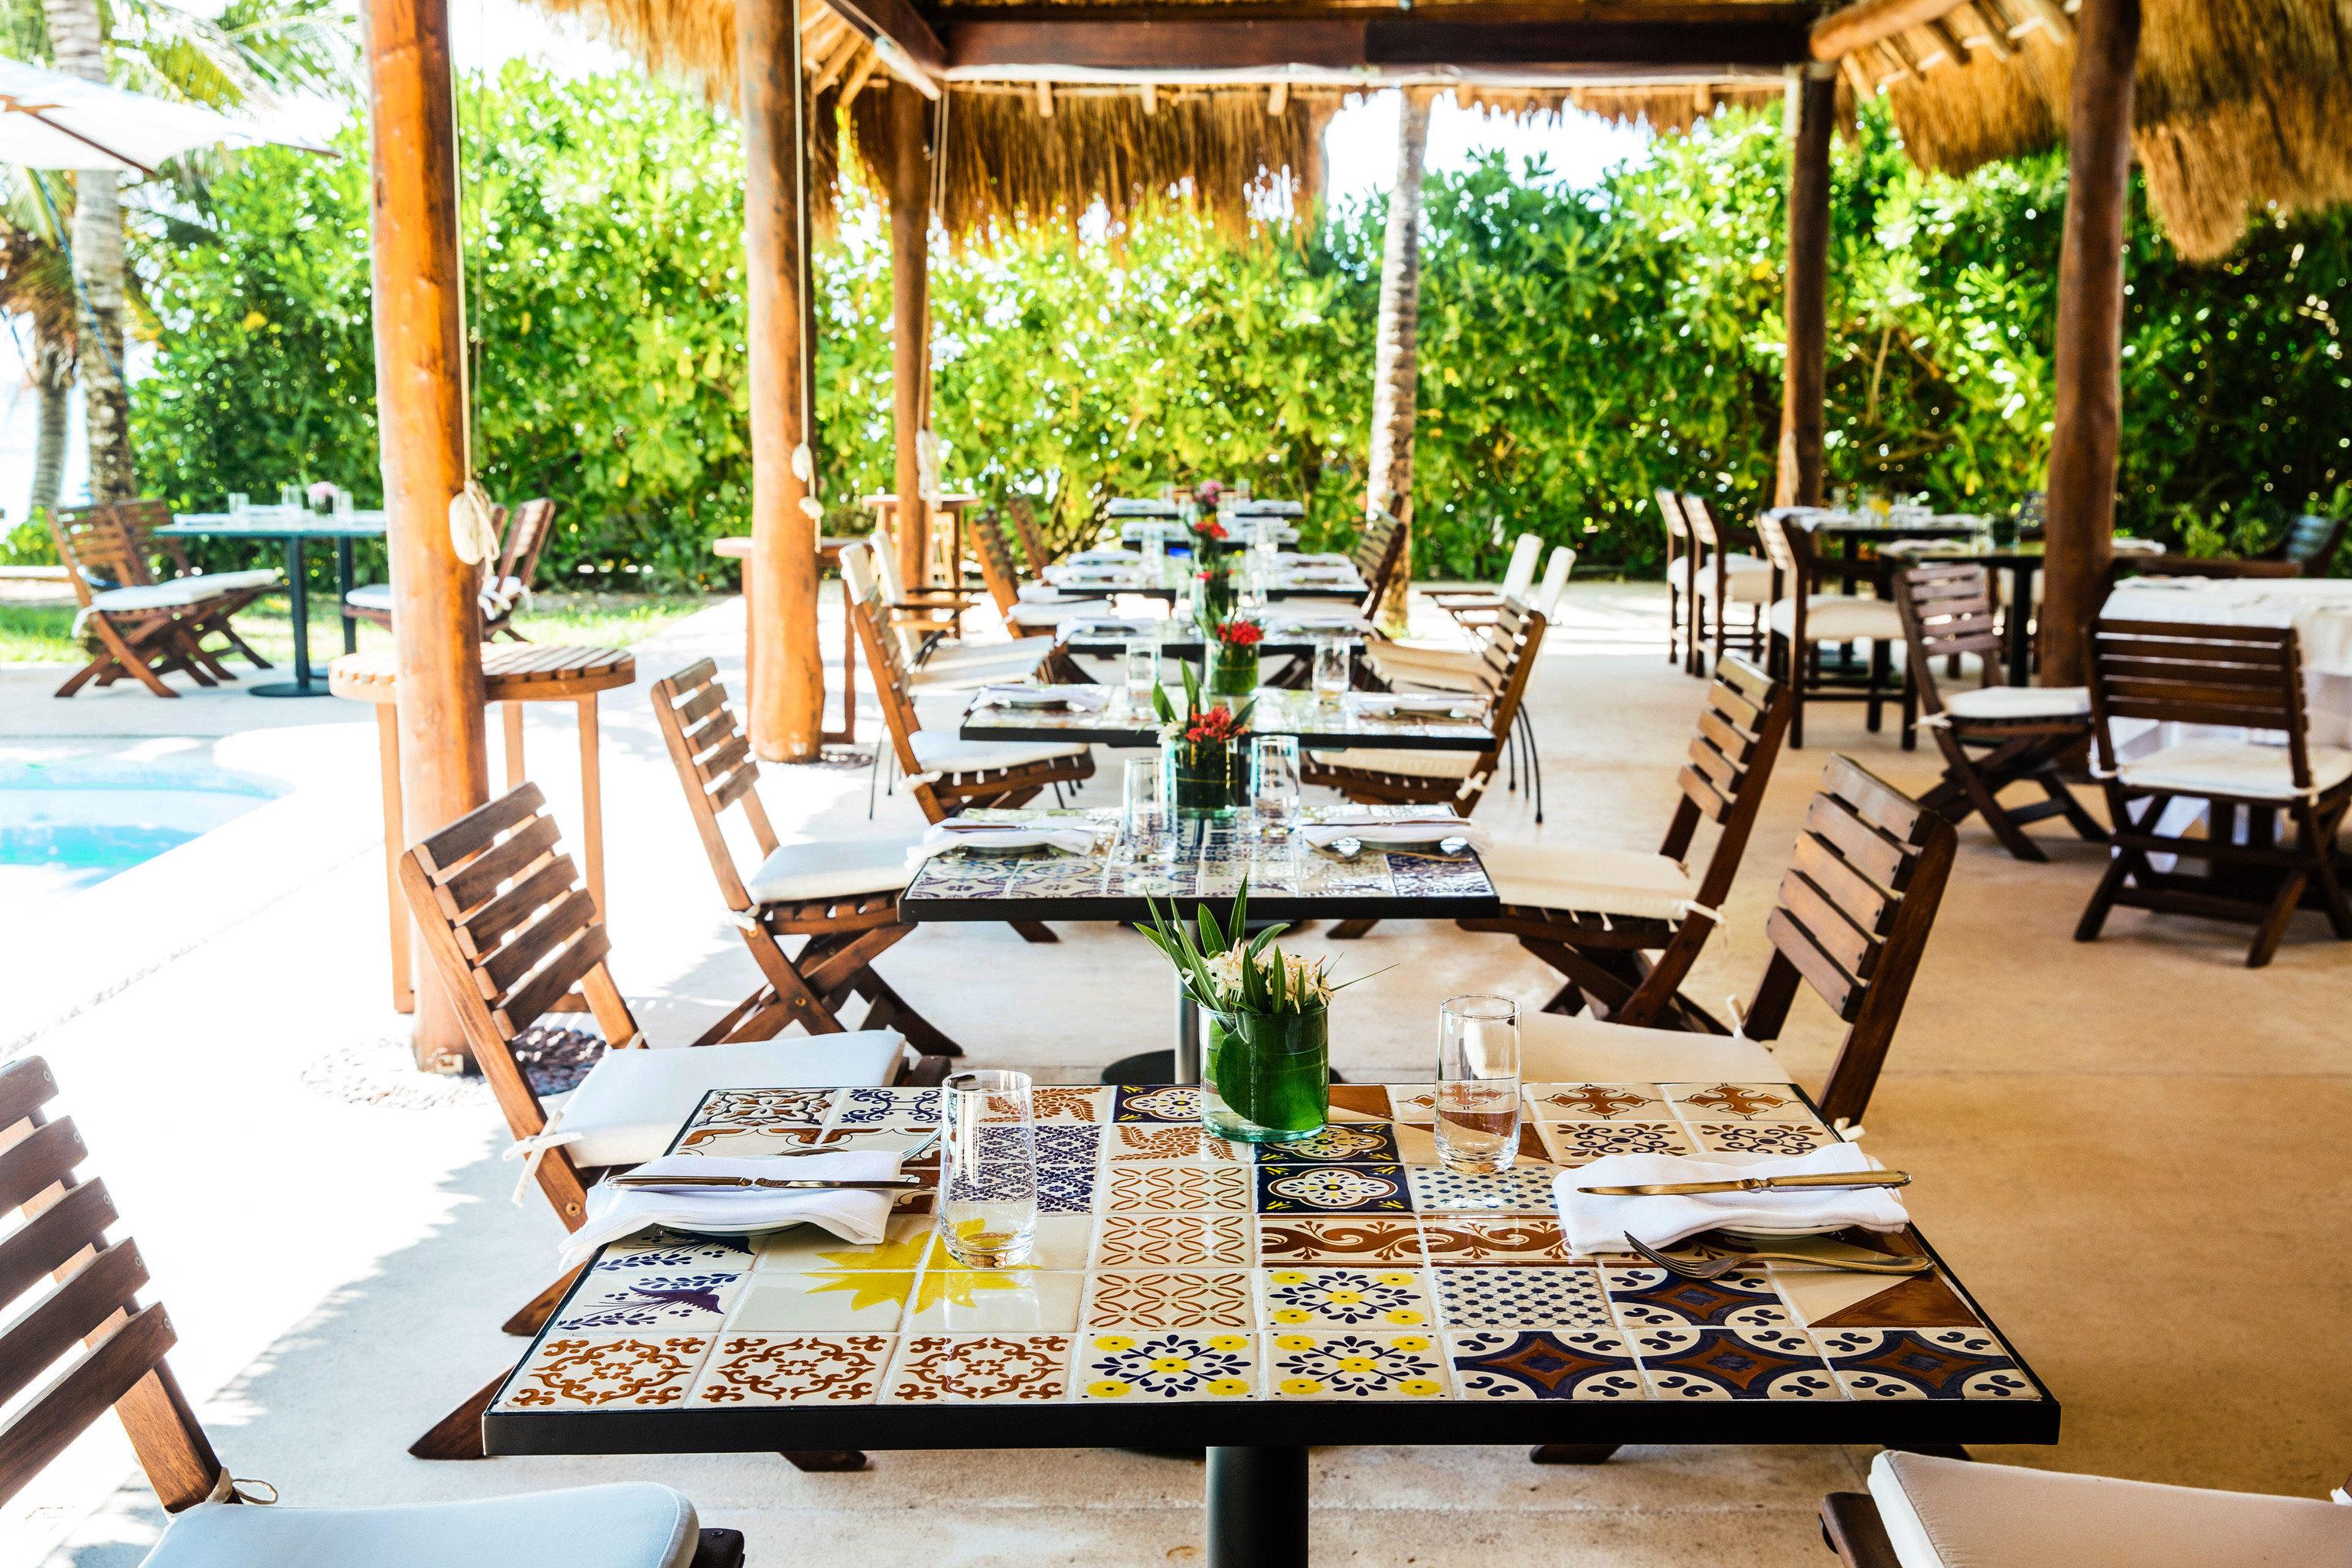 Budget tree chair Picnic leisure wooden Dining Resort backyard restaurant set Deck dining table